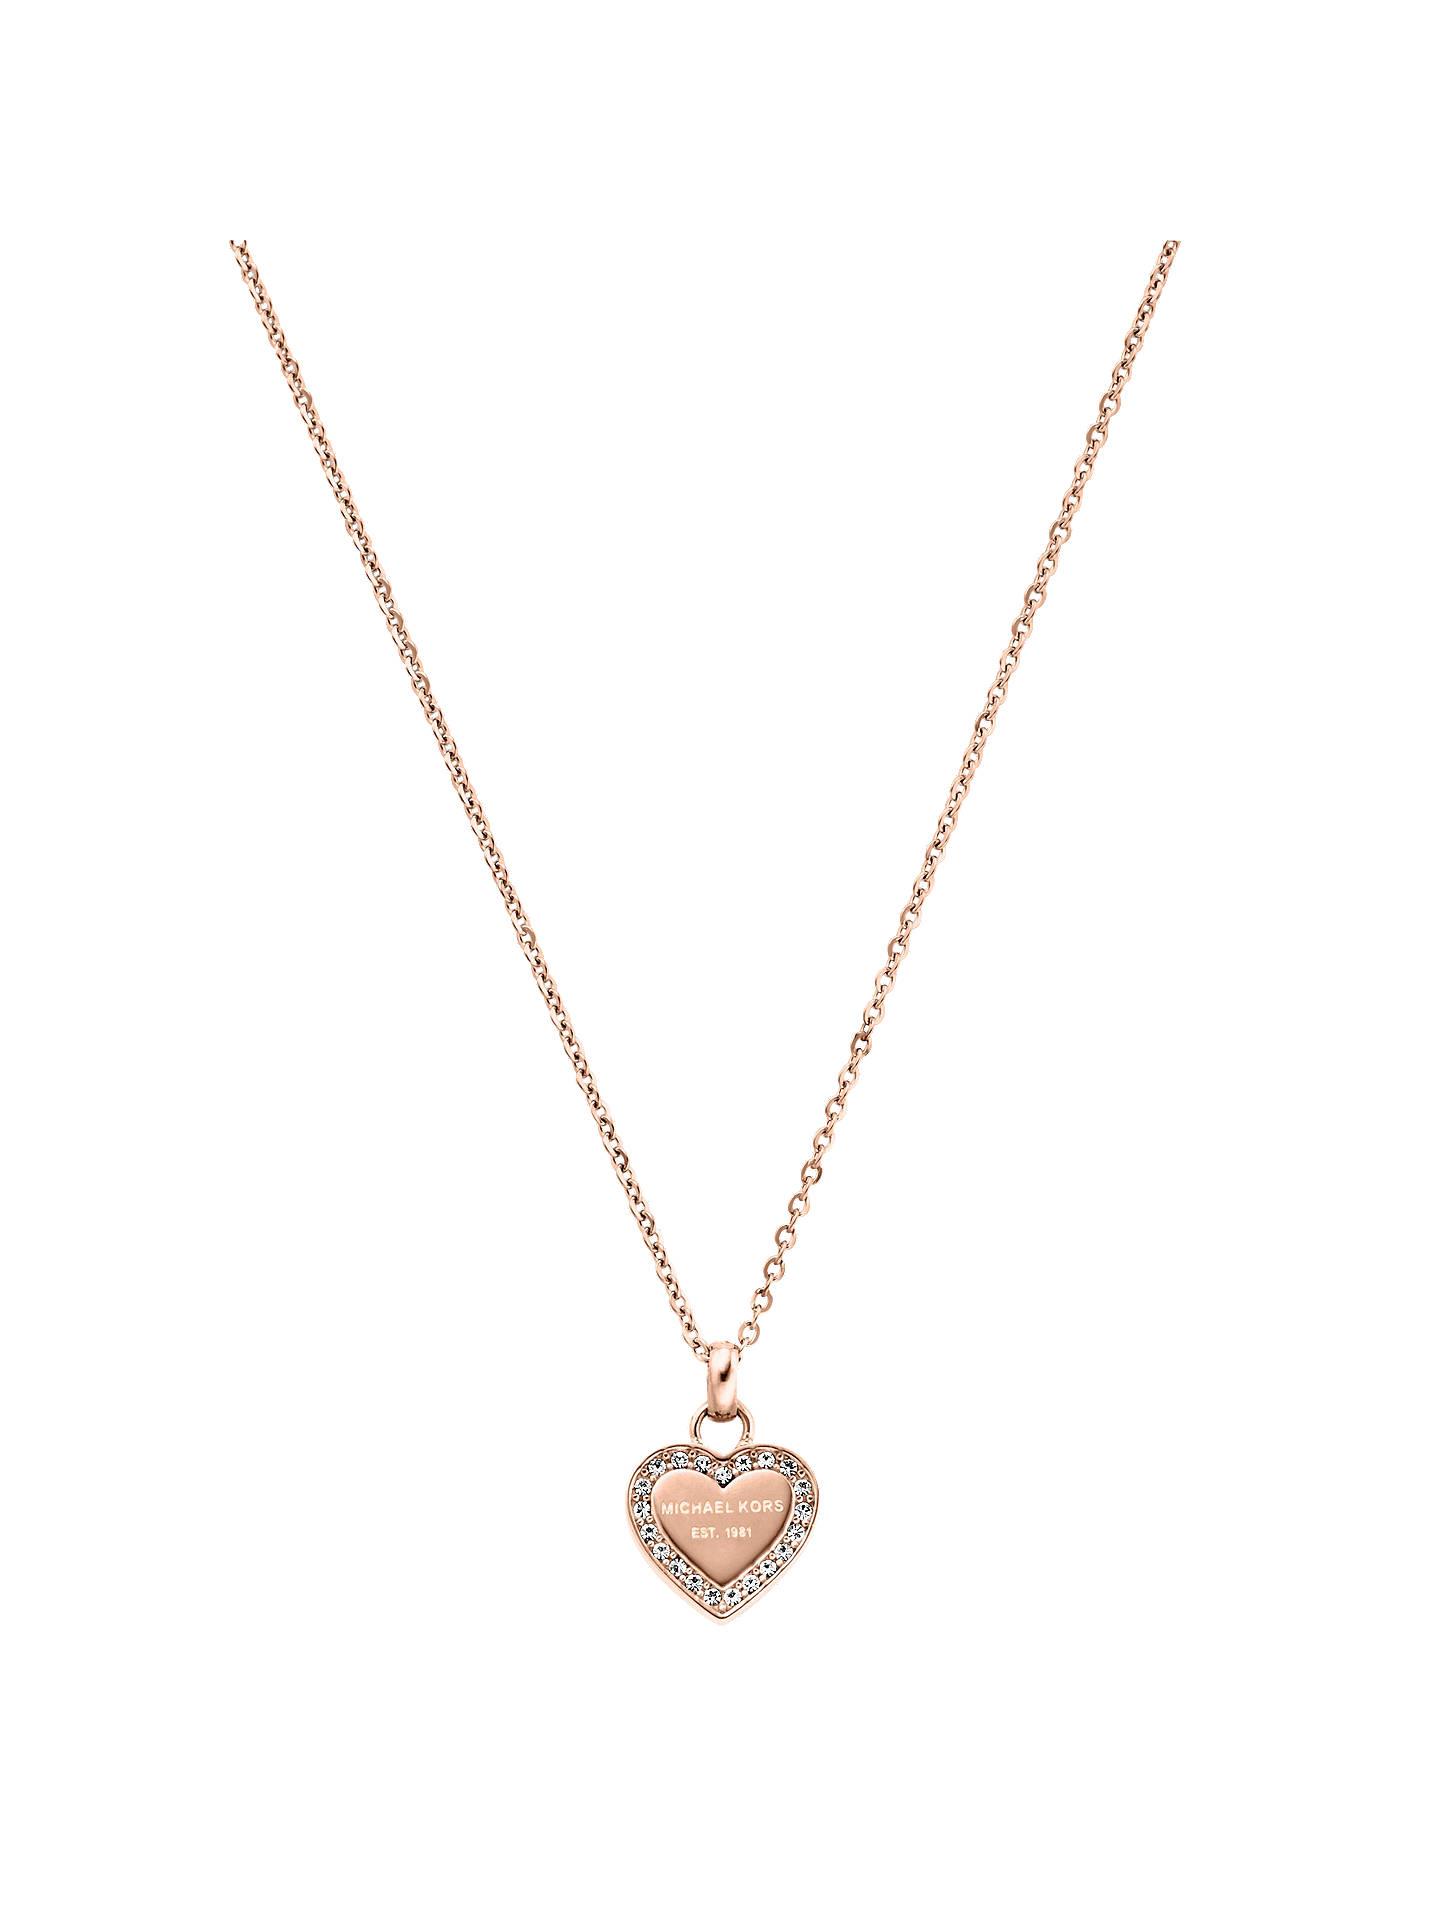 Michael Kors Heart Pendant Necklace Rose Gold Online At Johnlewis